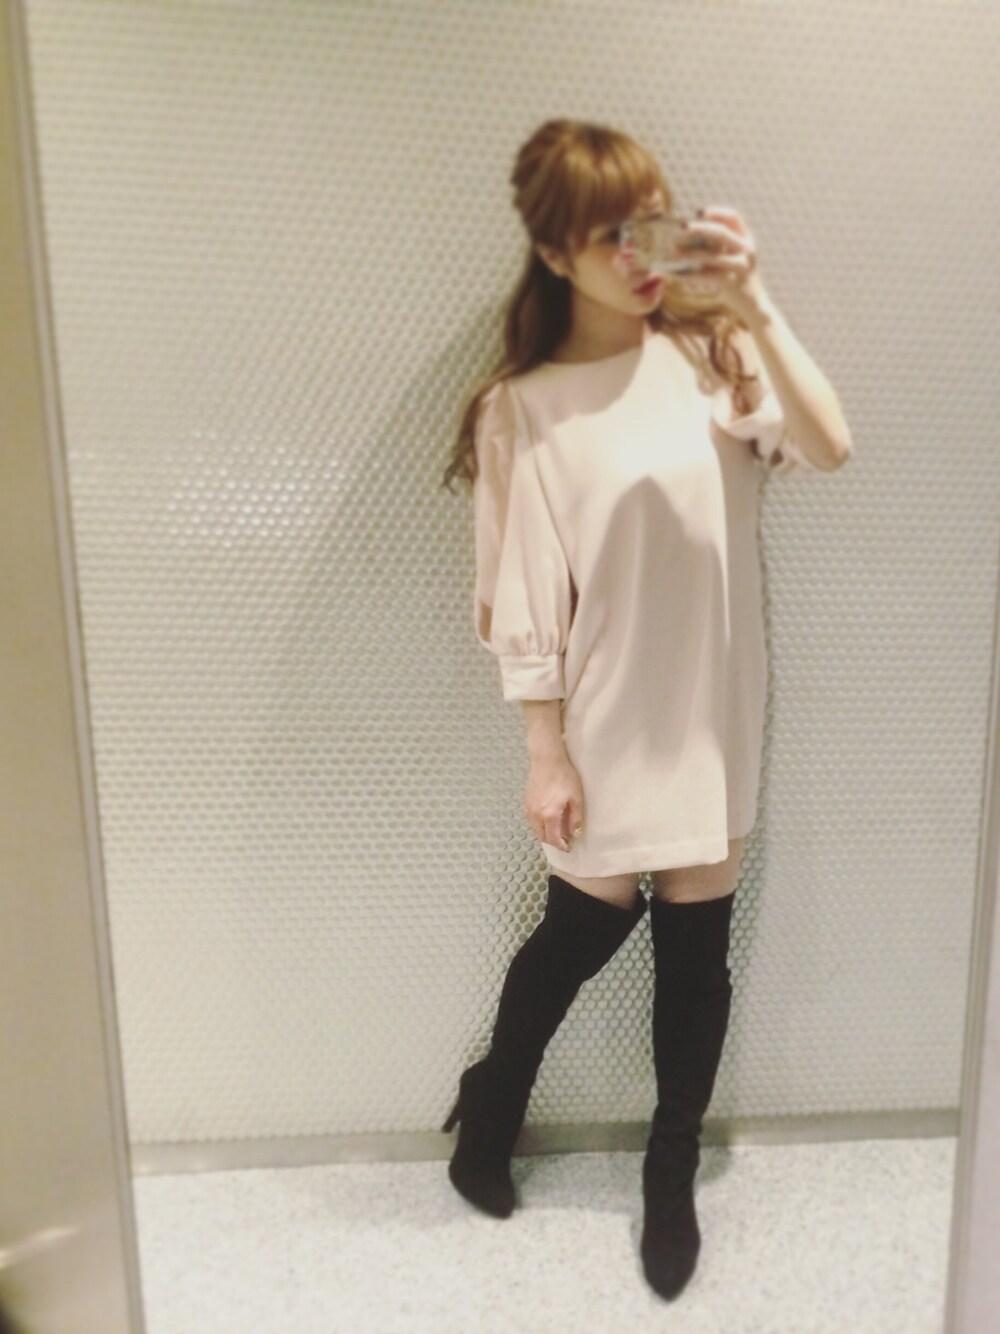 出典:http://wear.jp/gyuunyu1/5544134/